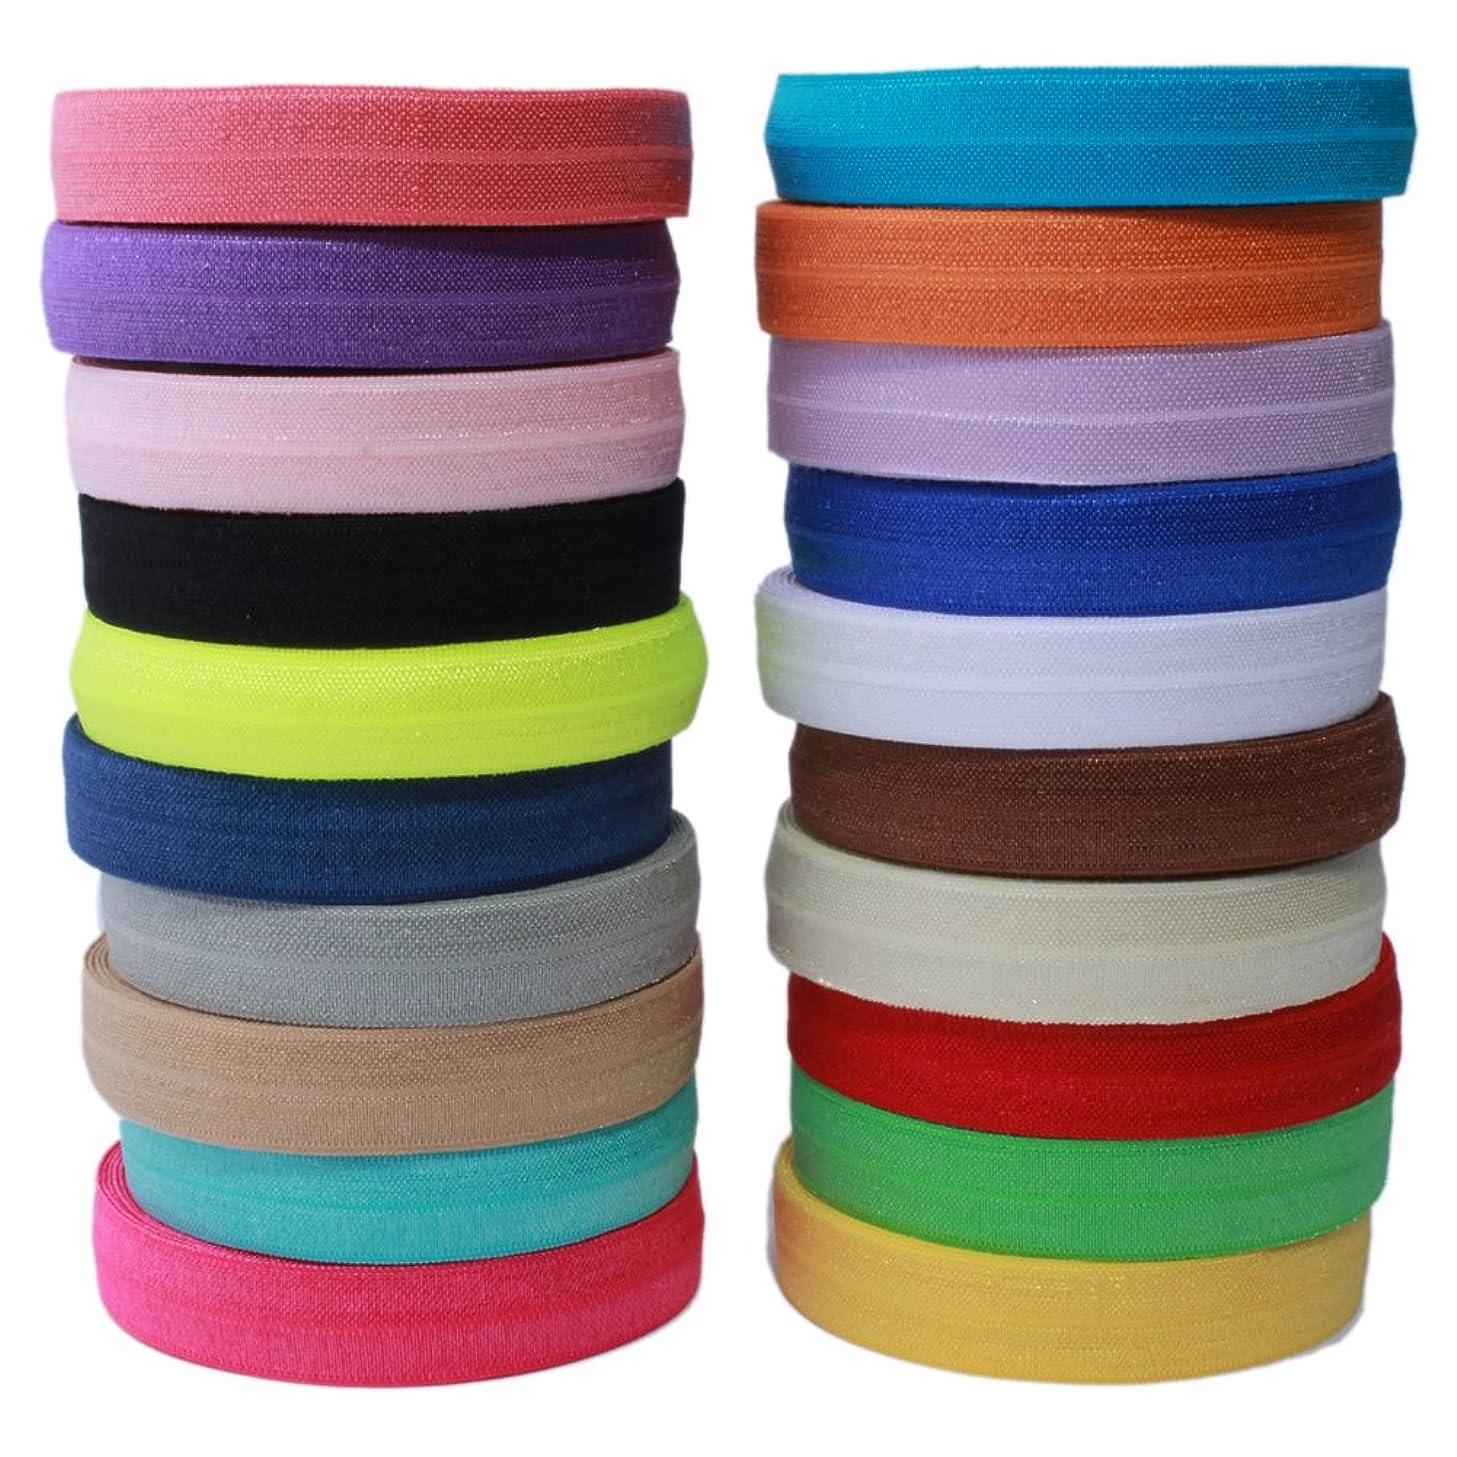 MASOKAN 100 Yards Ribbon Elastic Foldover Elastics Stretch Hair Ties Headbands for Baby Girls Hair Bow (5/8